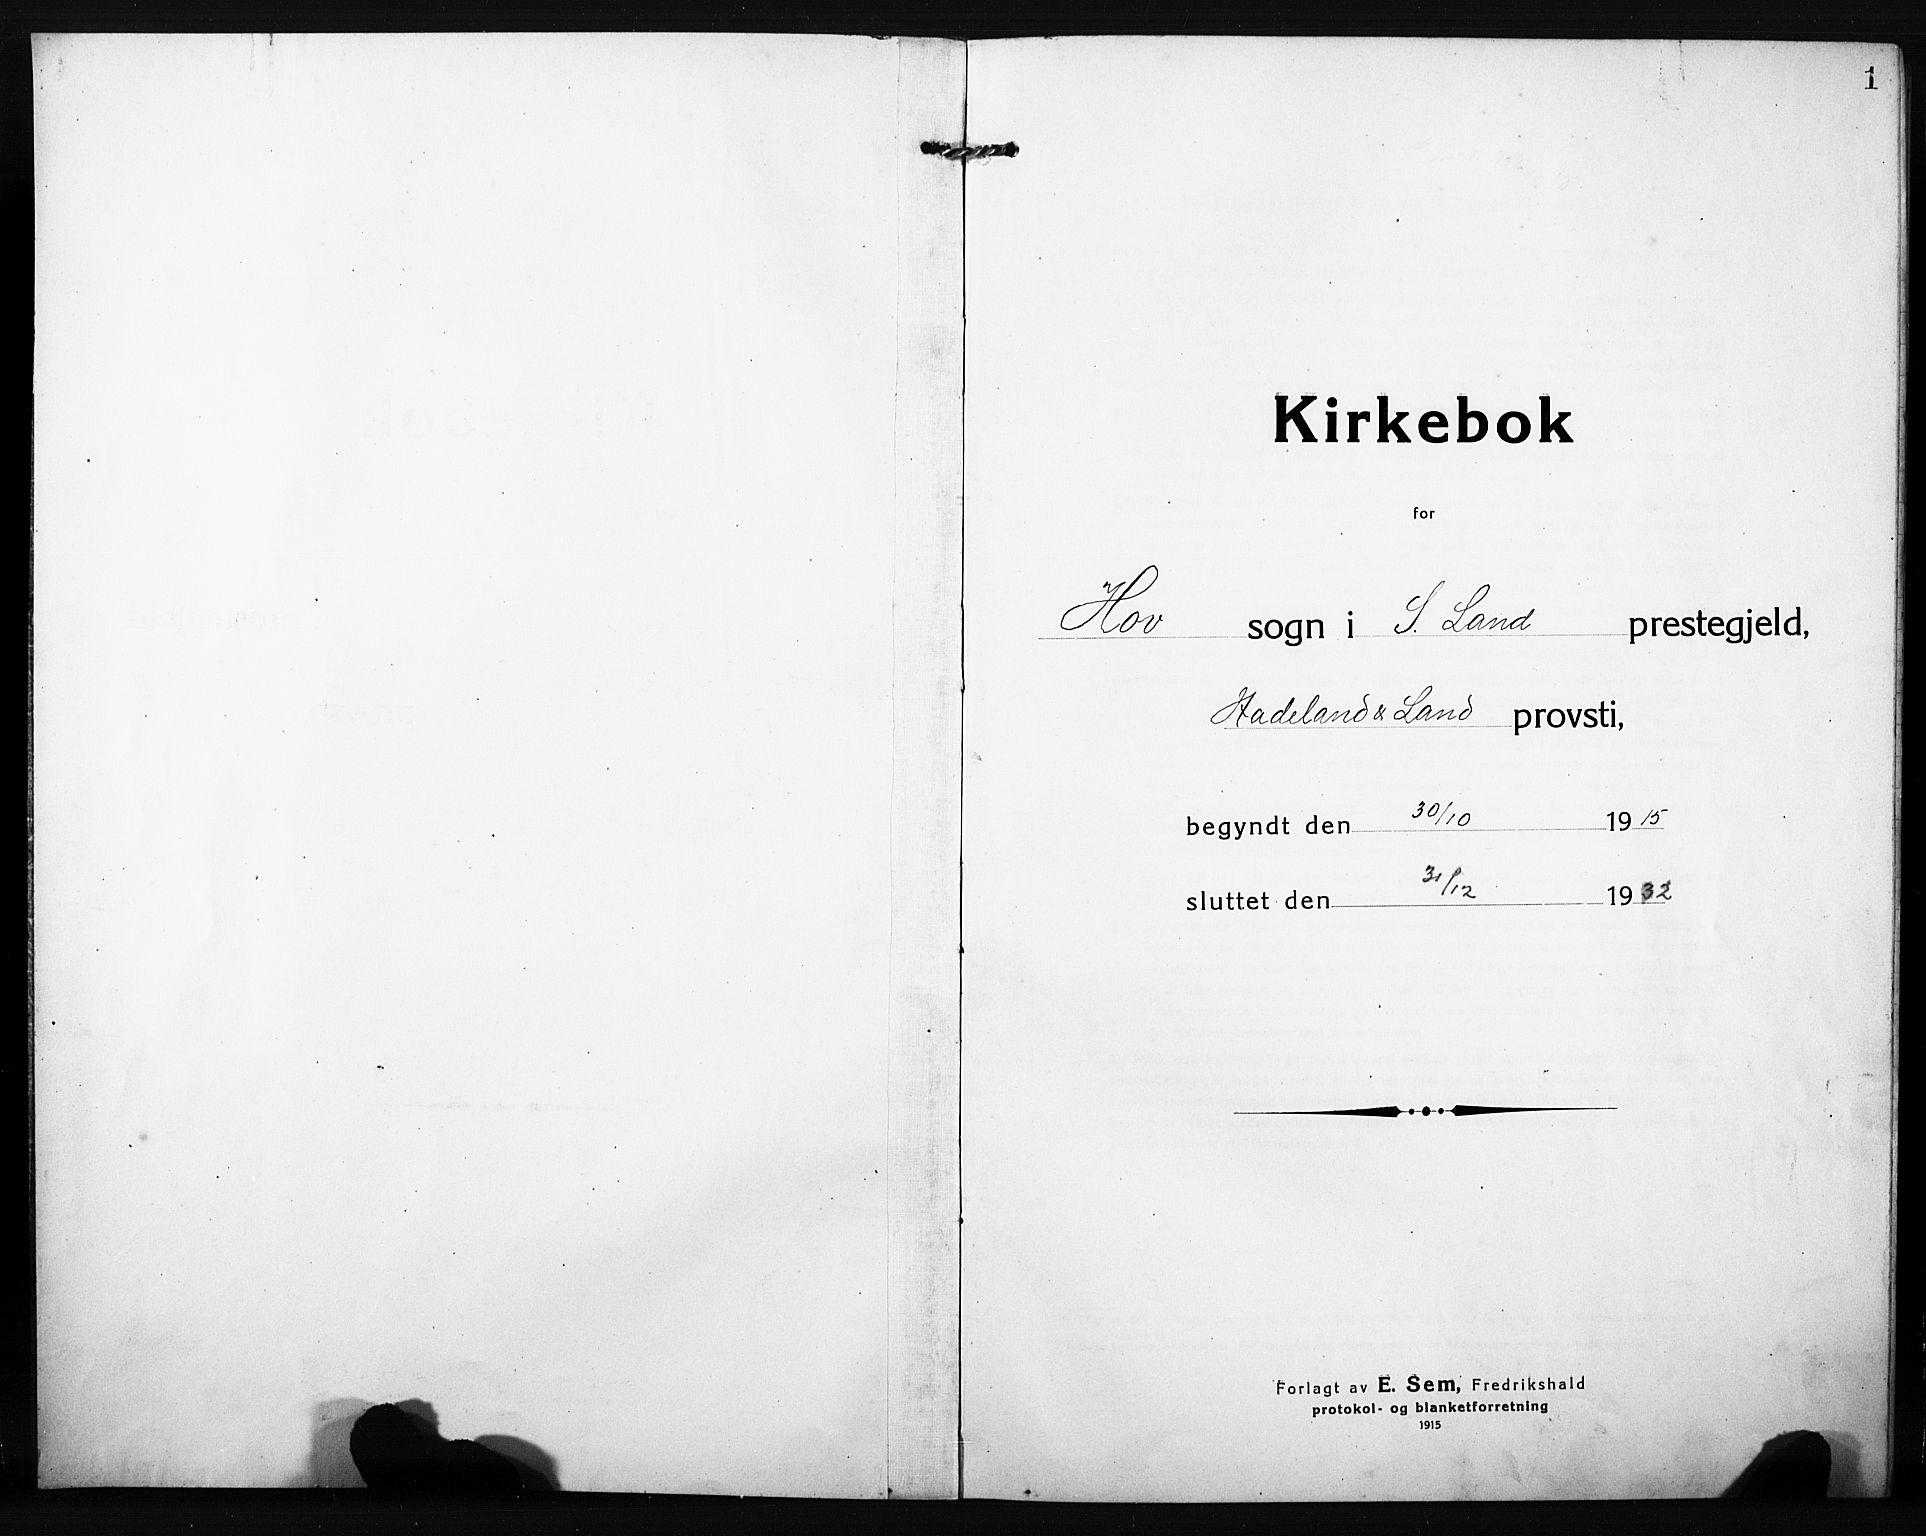 SAH, Søndre Land prestekontor, L/L0007: Klokkerbok nr. 7, 1915-1932, s. 1